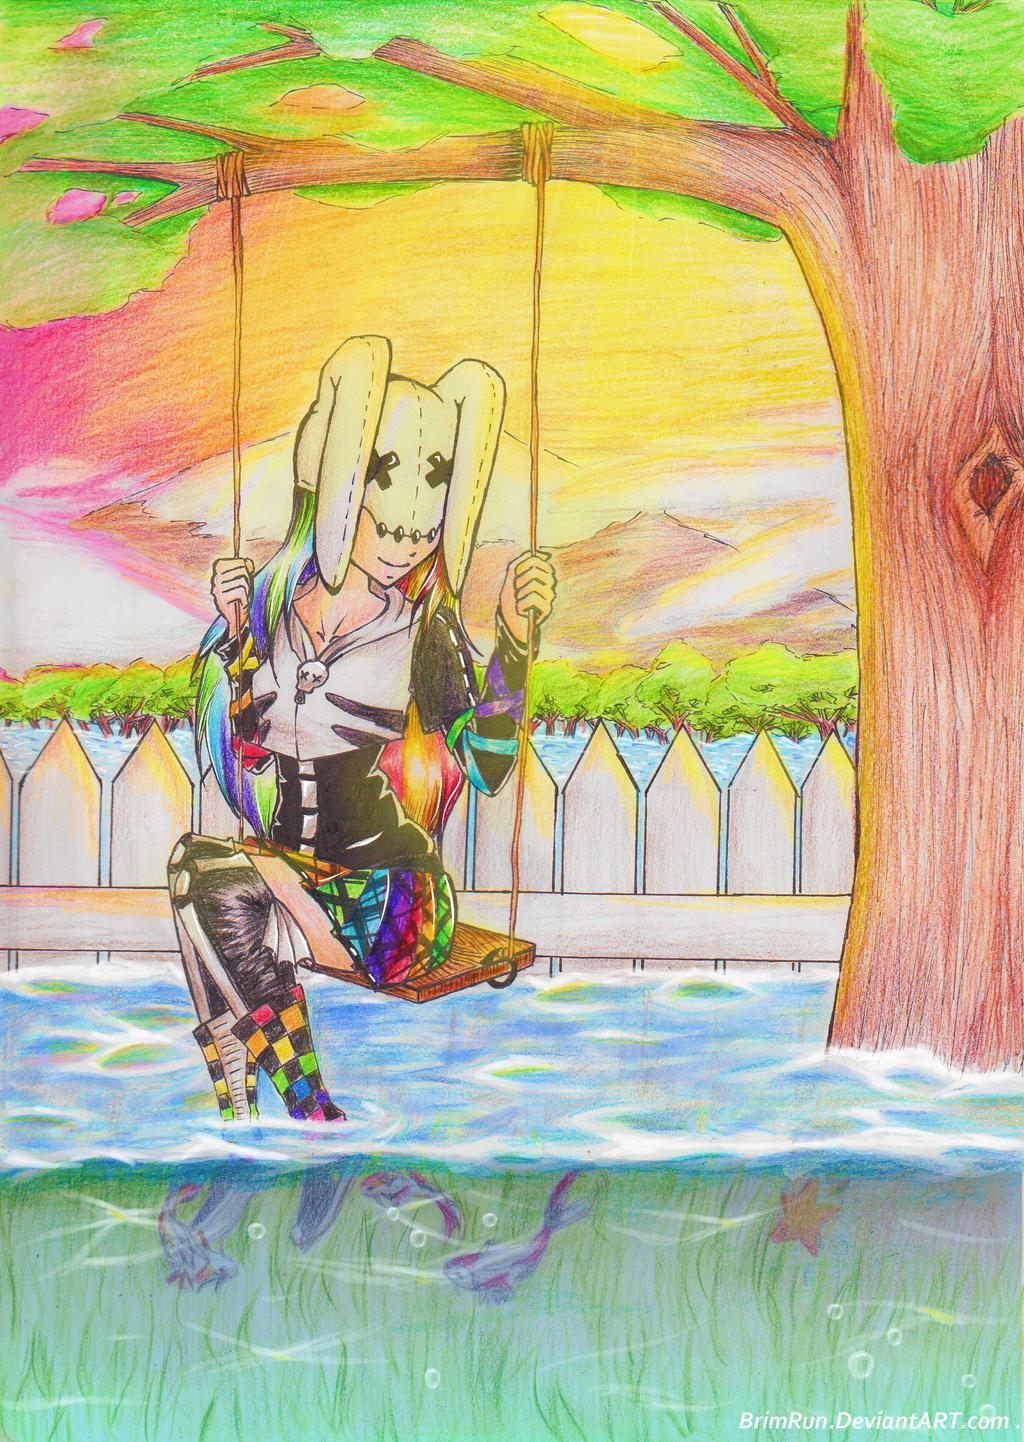 World full of Water - DeadB by BrimRun